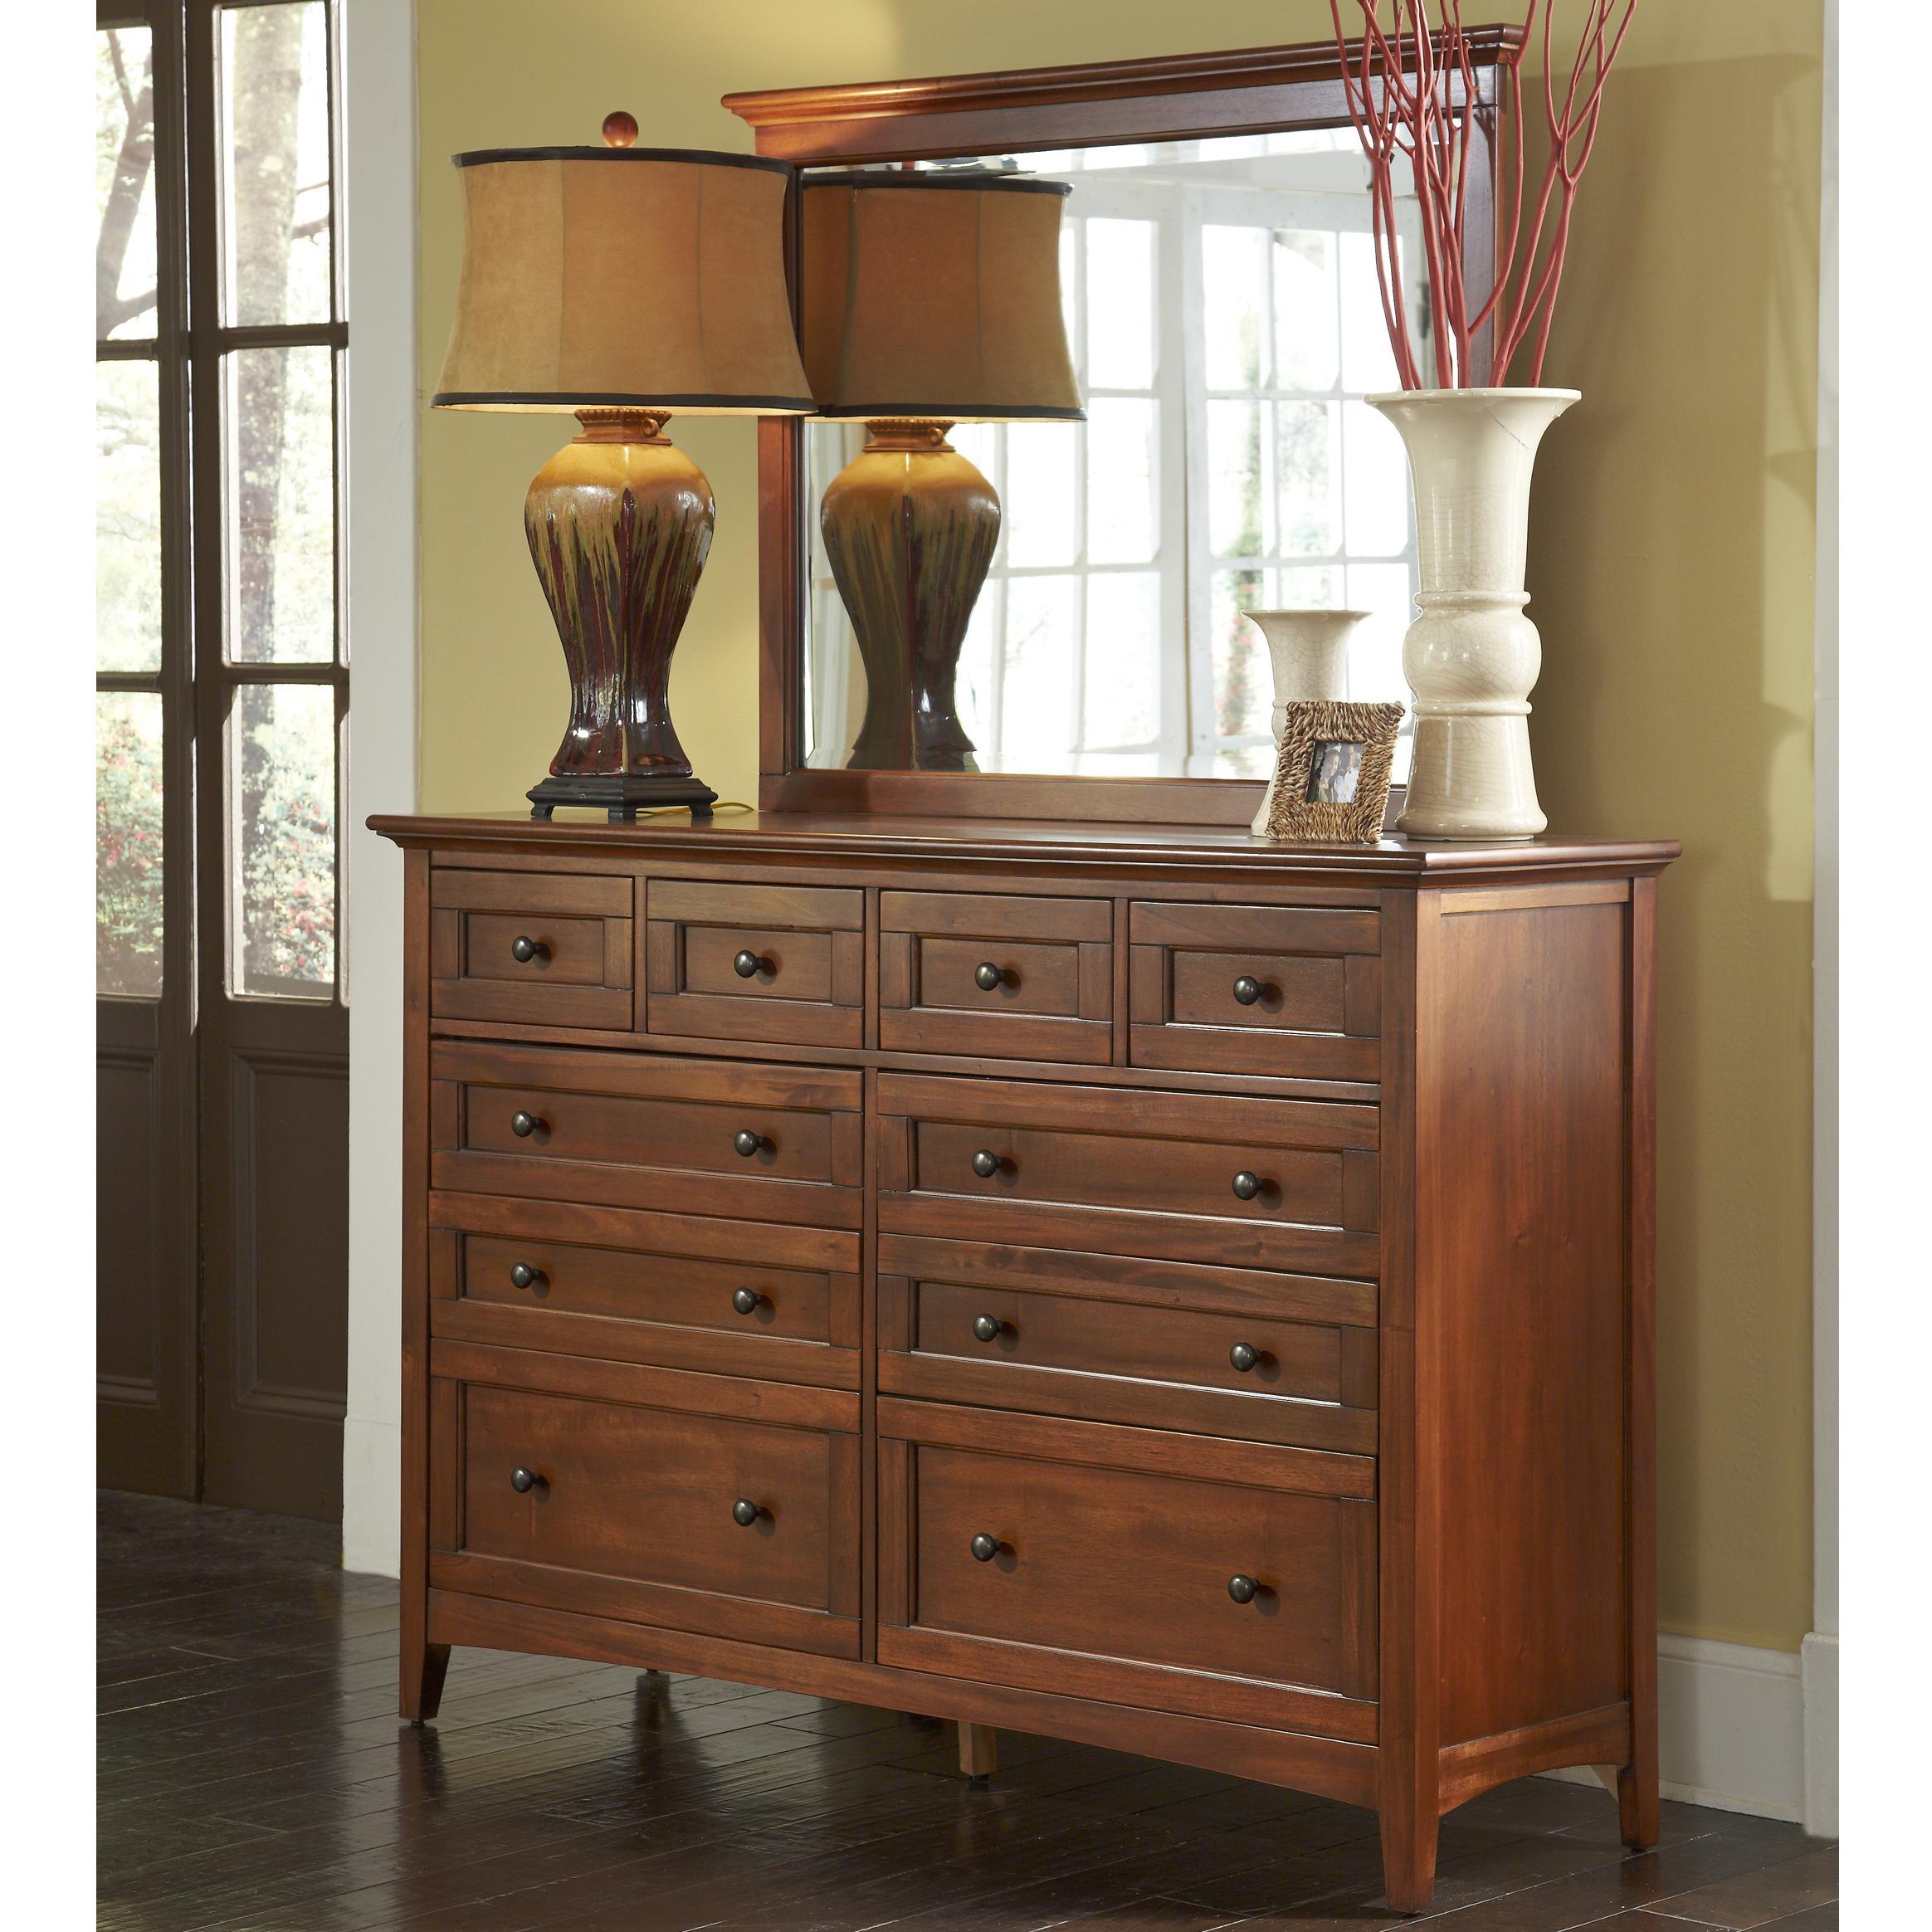 Transitional 10-Drawer Dresser with Landscape Mirror